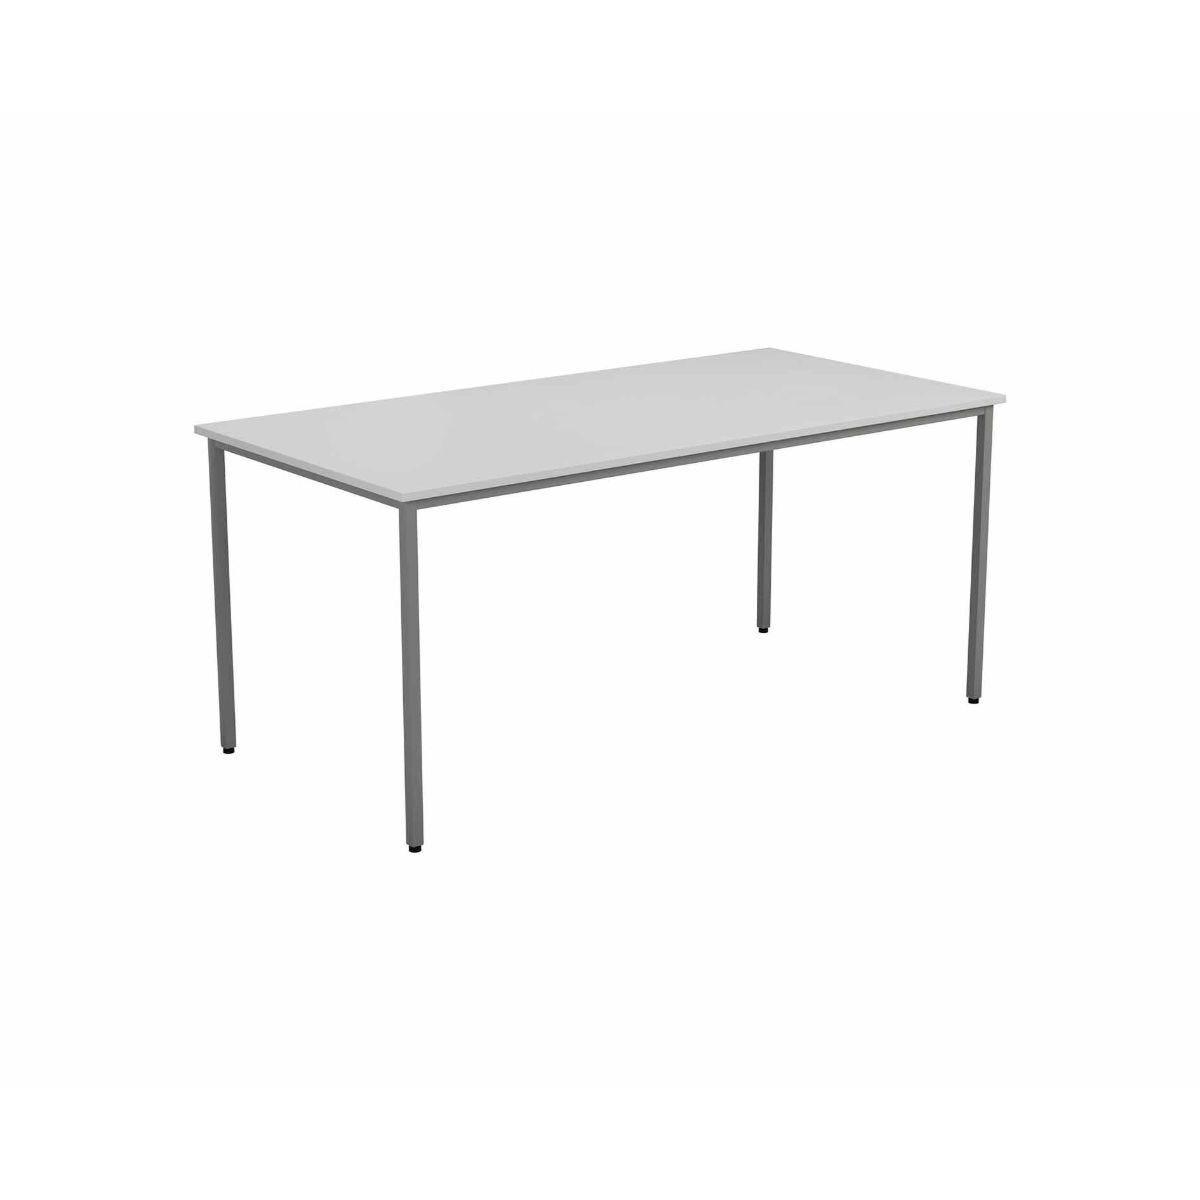 TC Office Rectangular Table 1800 x 800mm White